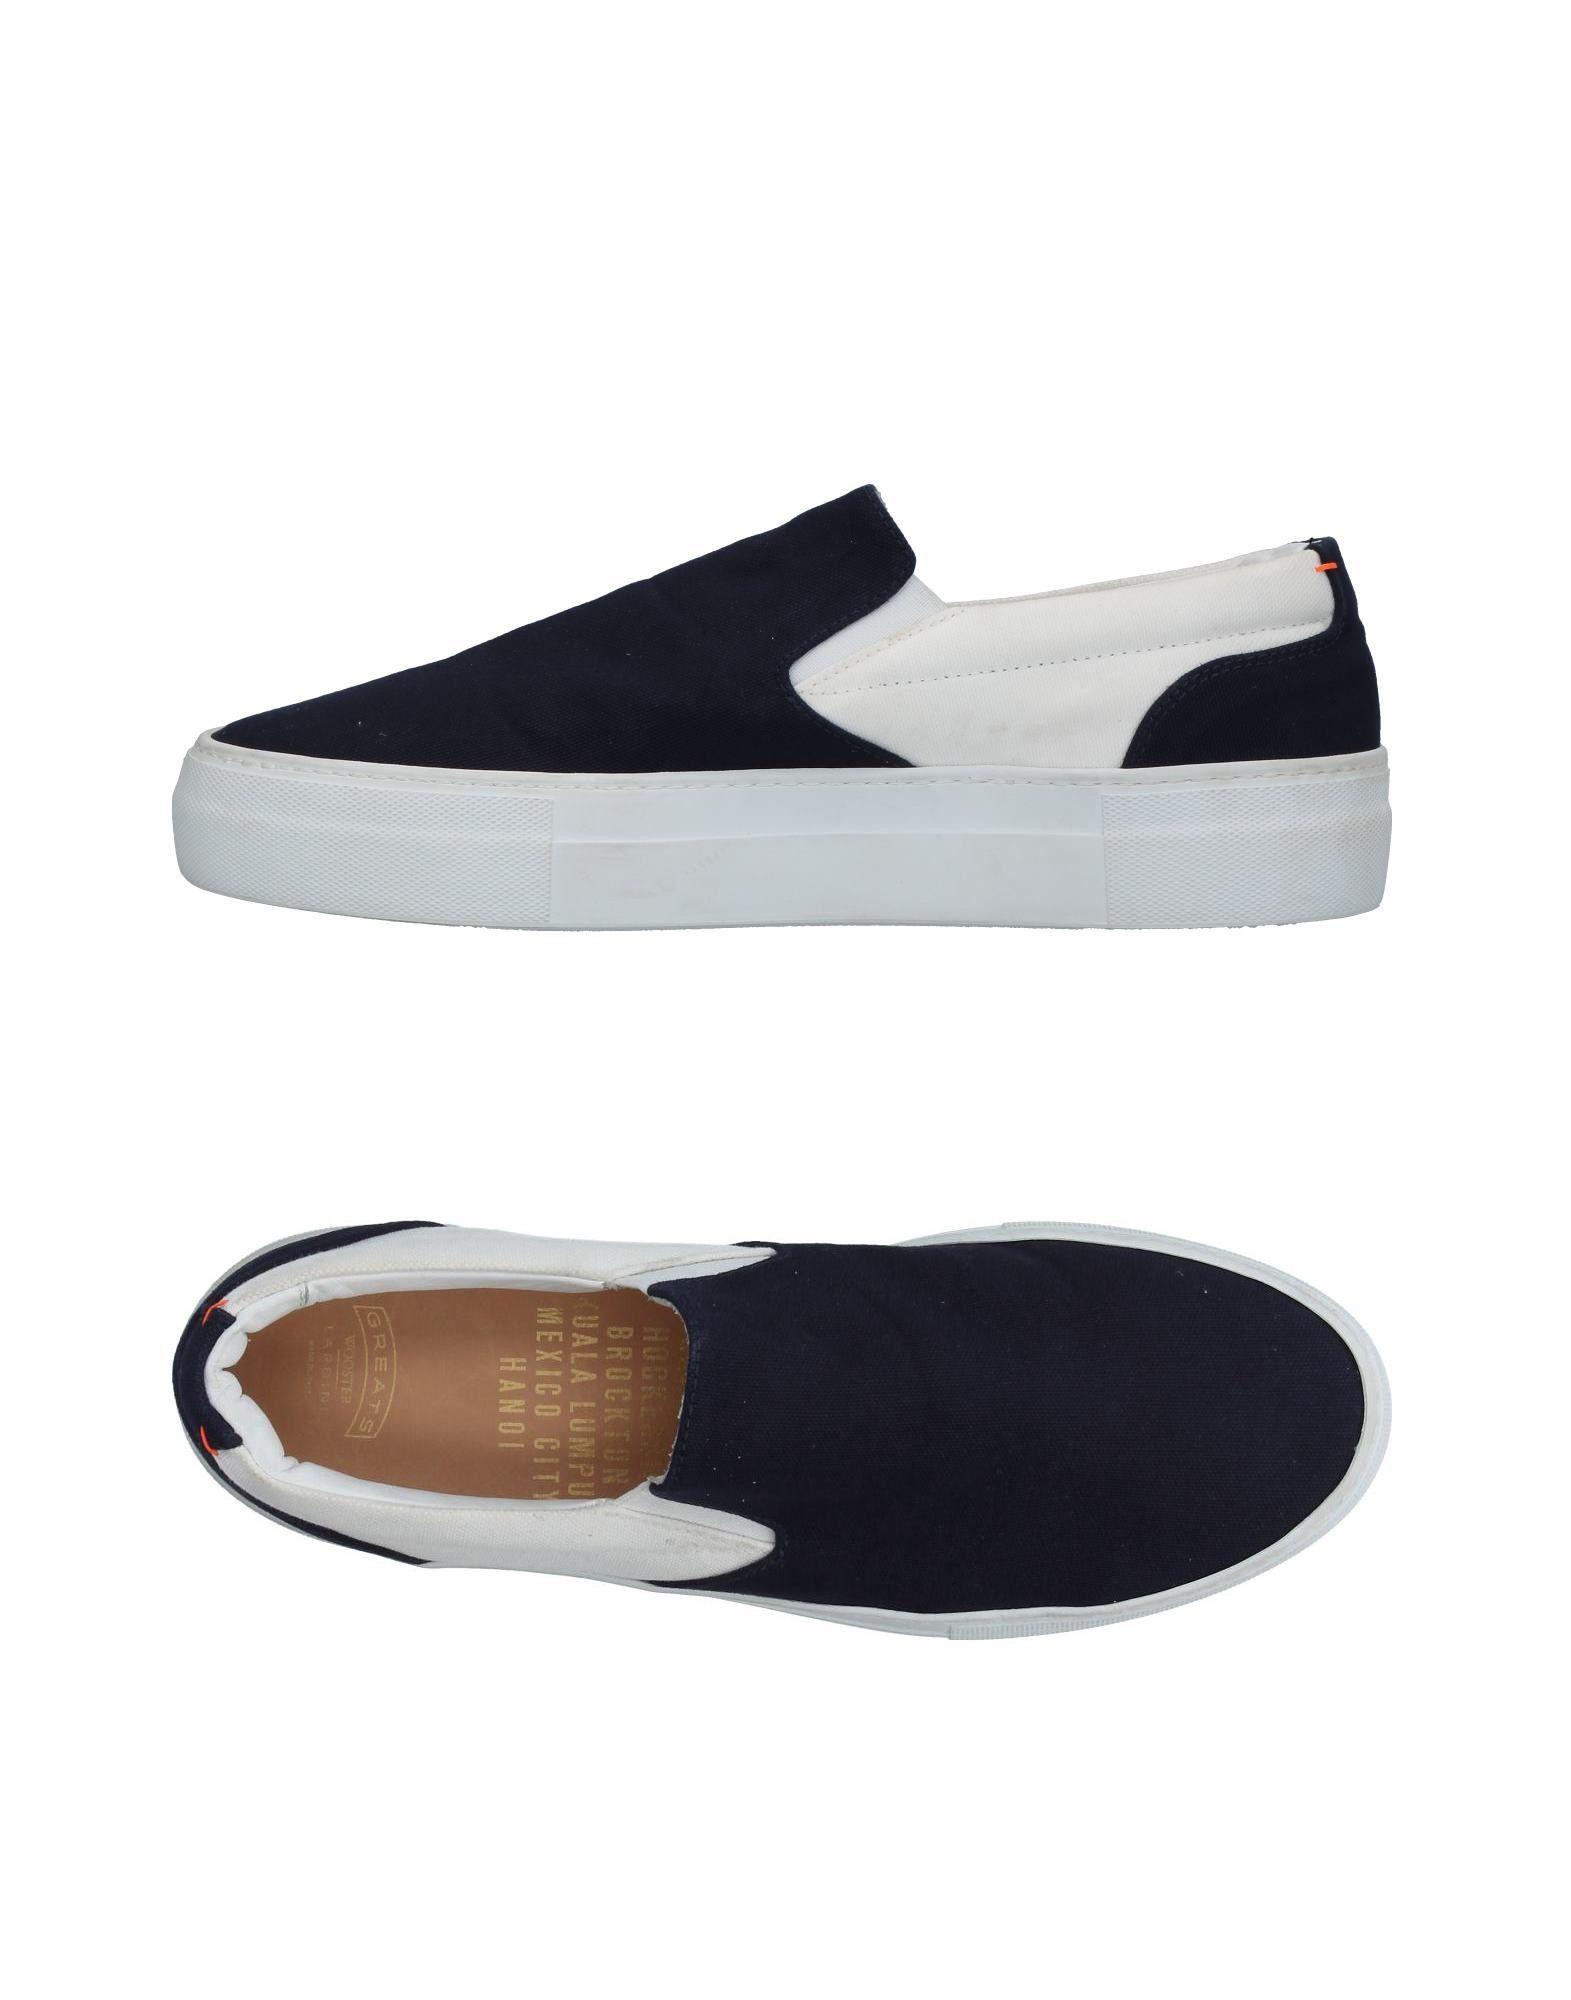 GREATS Sneakers in Dark Blue